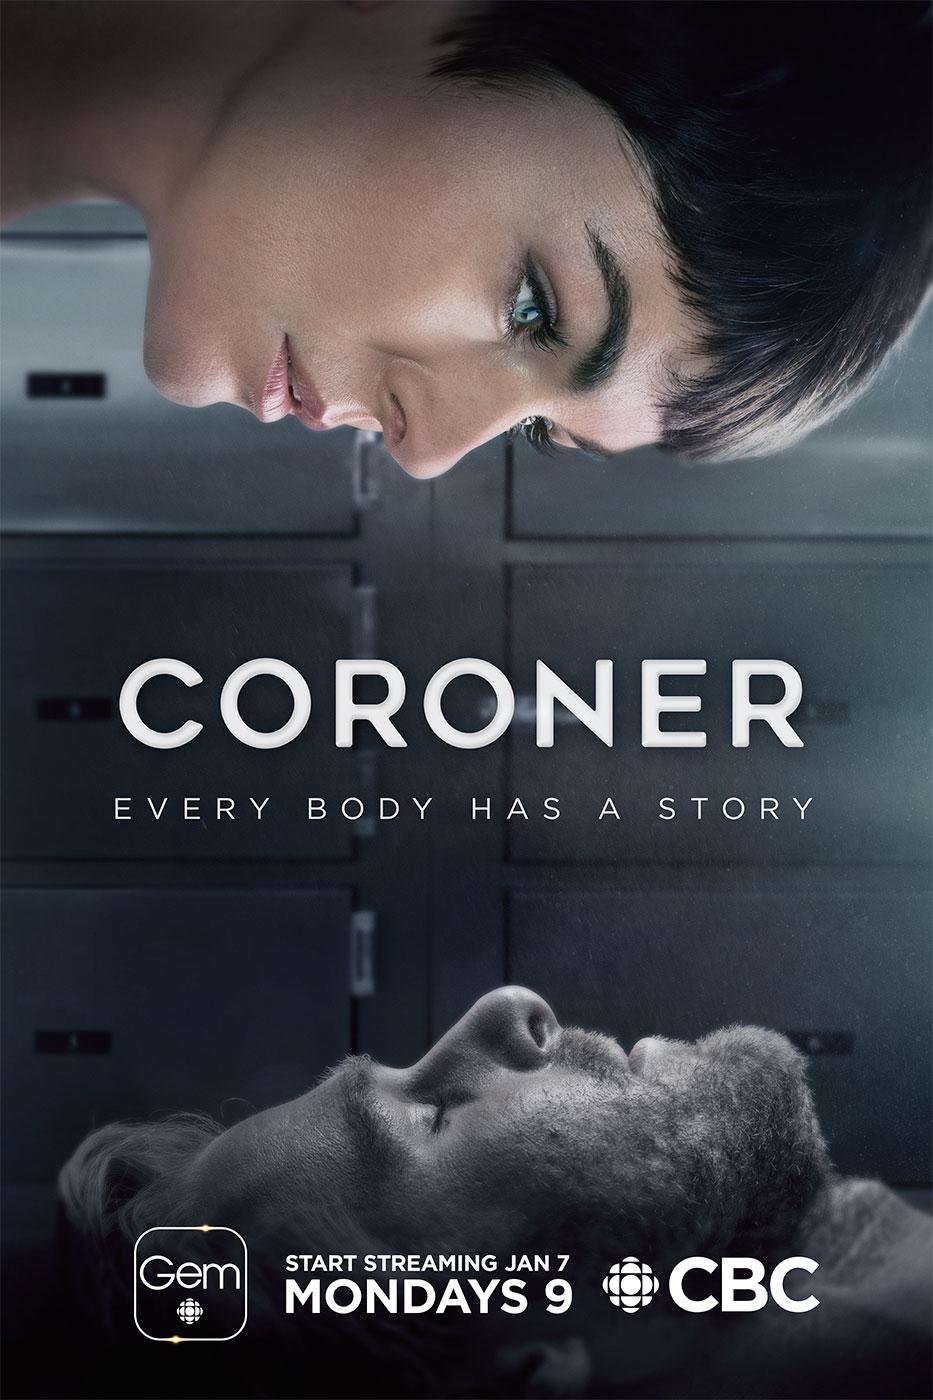 Coroner (TV Series 2019– ) - IMDb